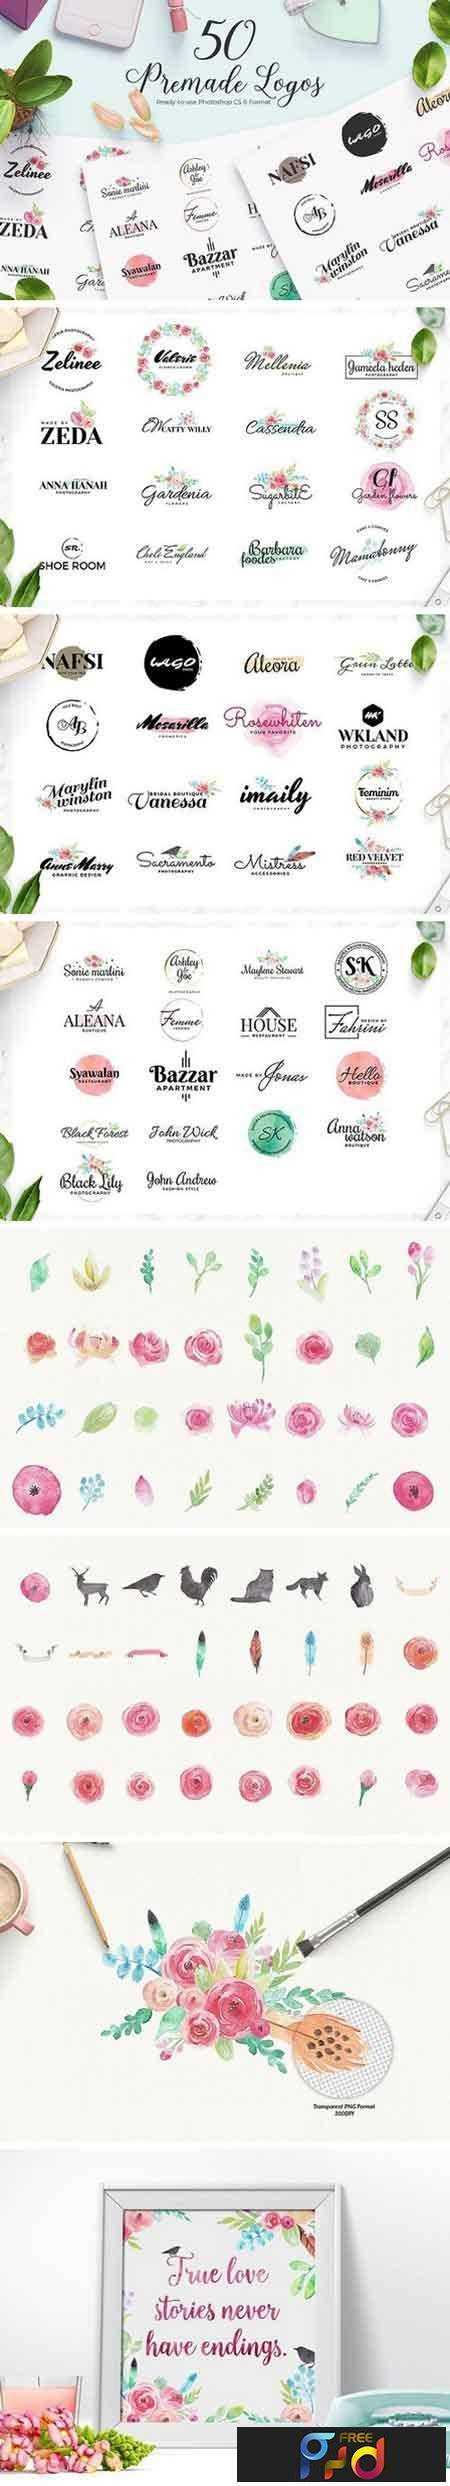 FreePsdVn.com_1705249_MOCKUP_50_premade_feminine_logos_1771021